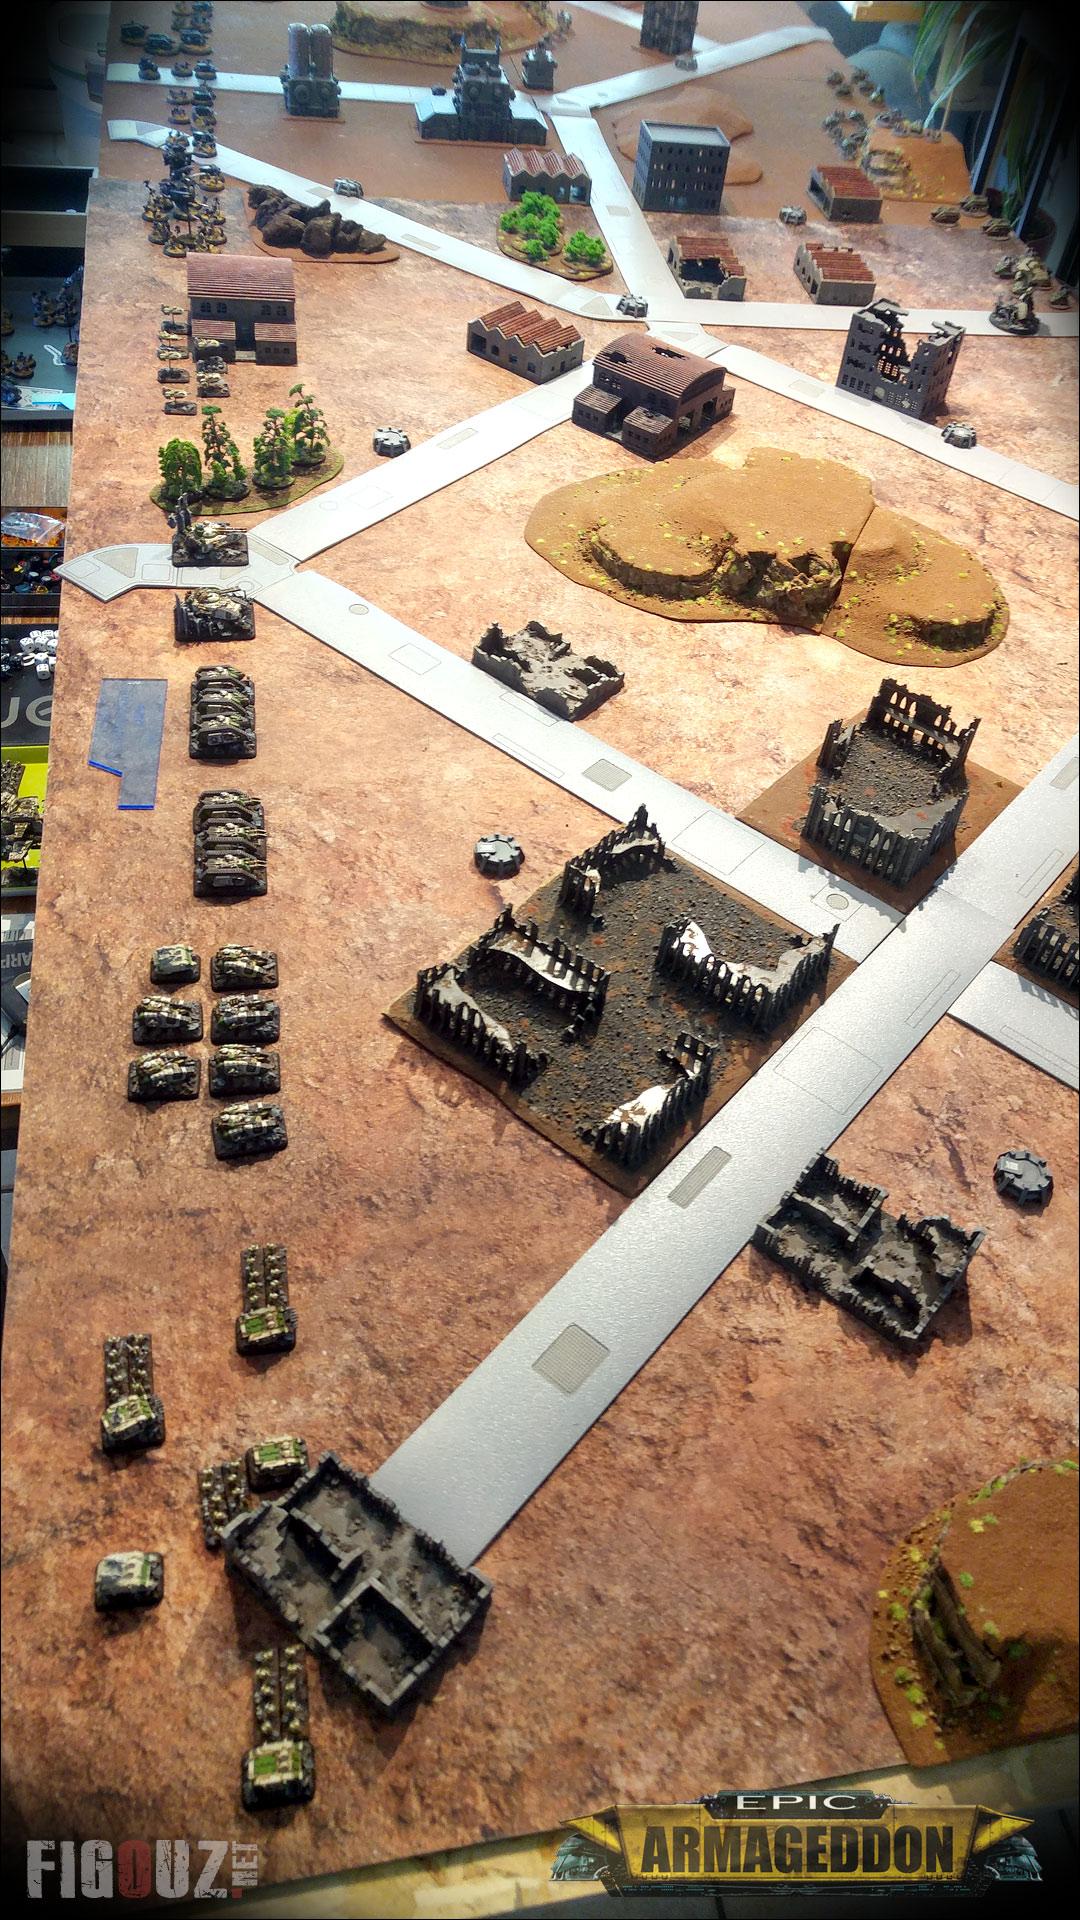 [Big Z] Death Korps, Legio Fureans, Death Guard Pré-Héresie - Page 23 Megageddon-05-2018-03